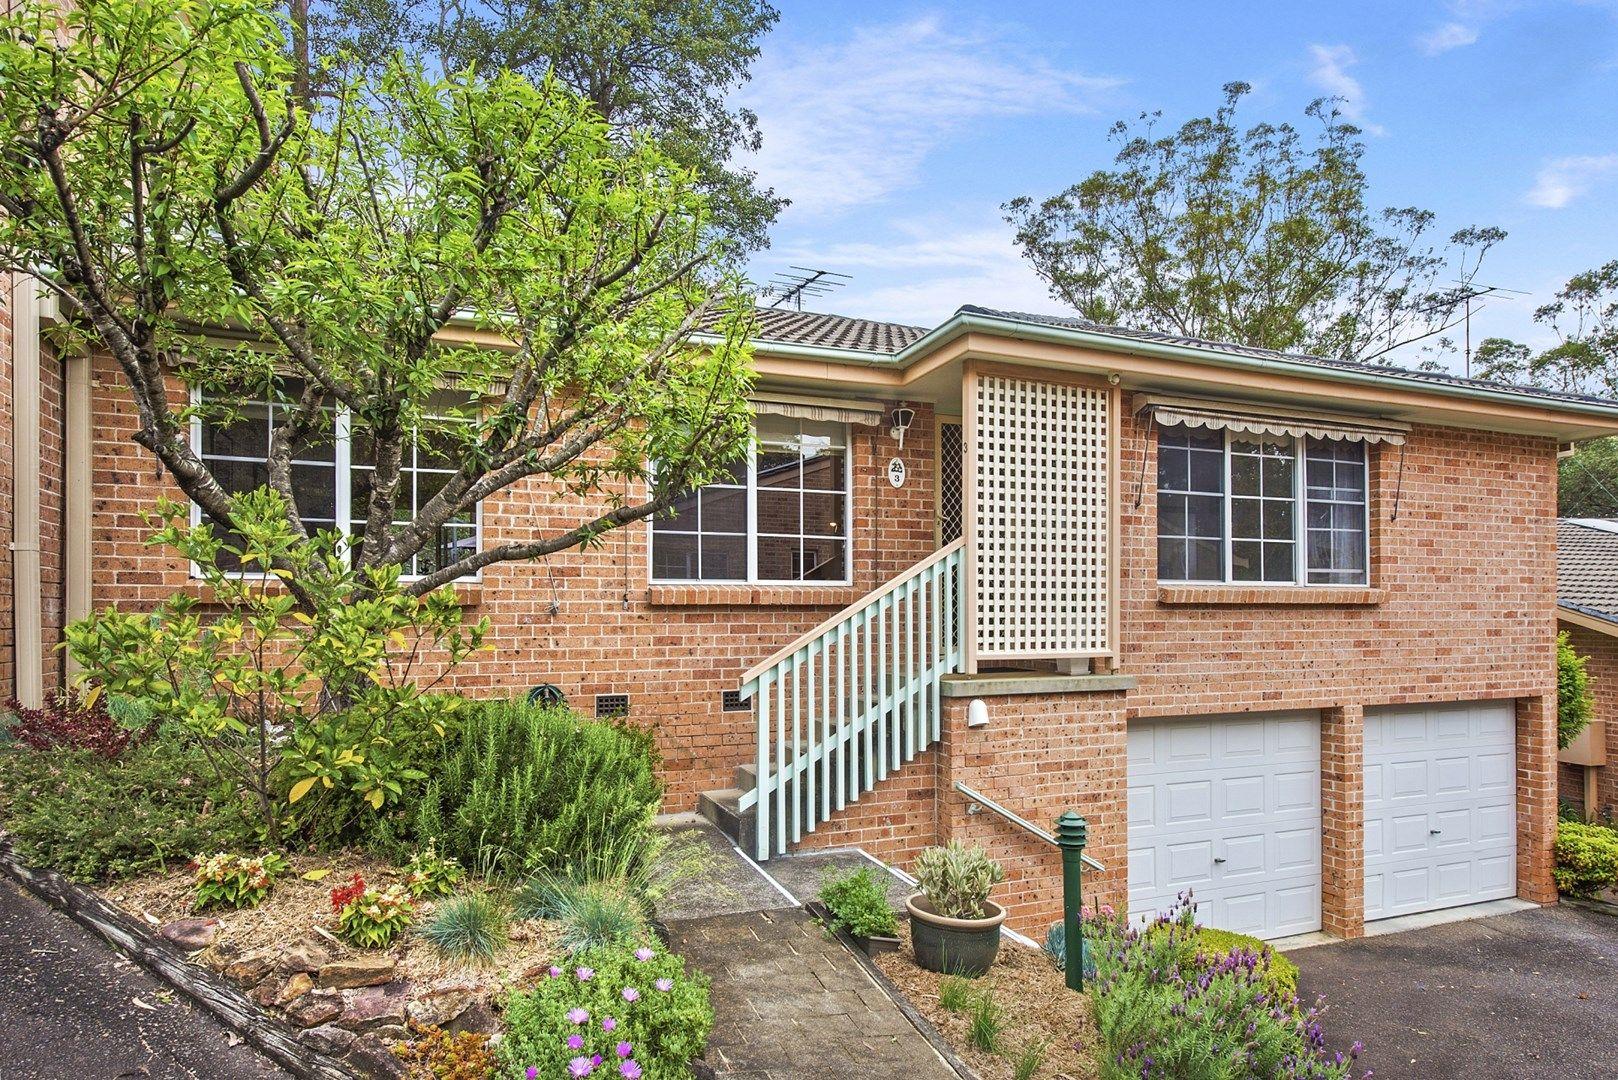 3/16 Handley Avenue, Thornleigh NSW 2120, Image 0